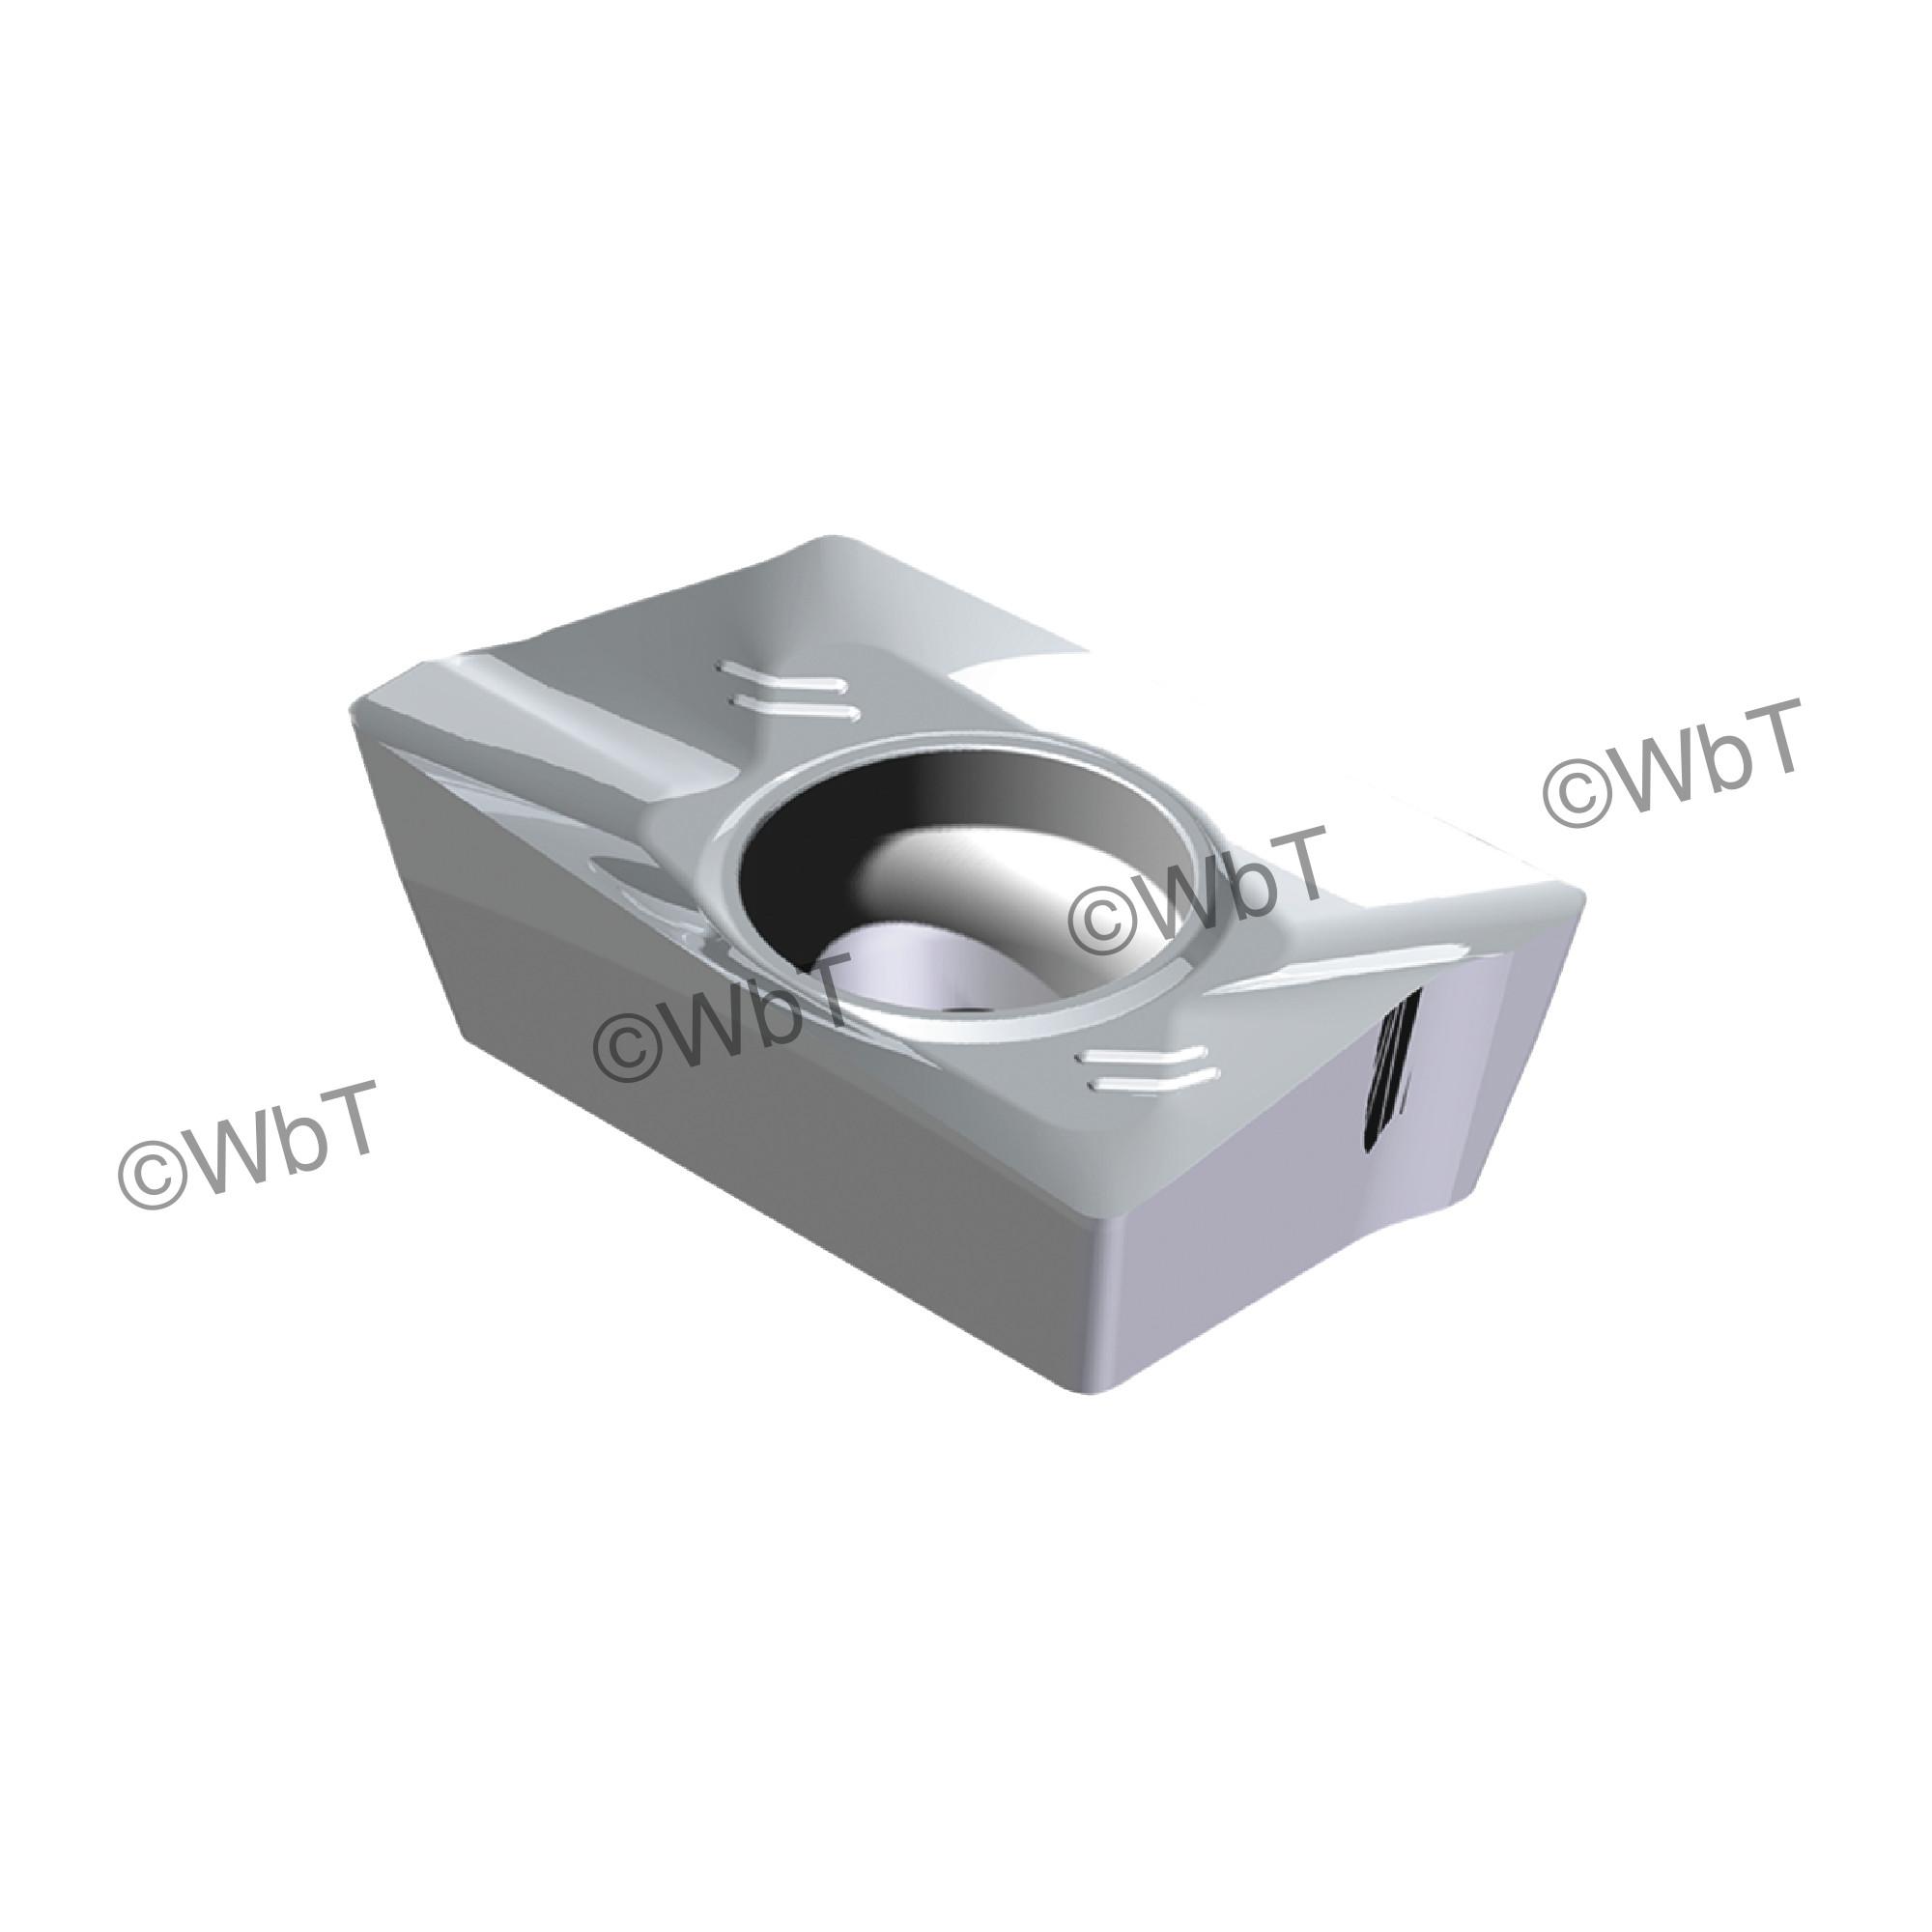 AKUMA - APHT100302FR-N1 JM10N Parallelogram / Indexable Carbide Milling Insert